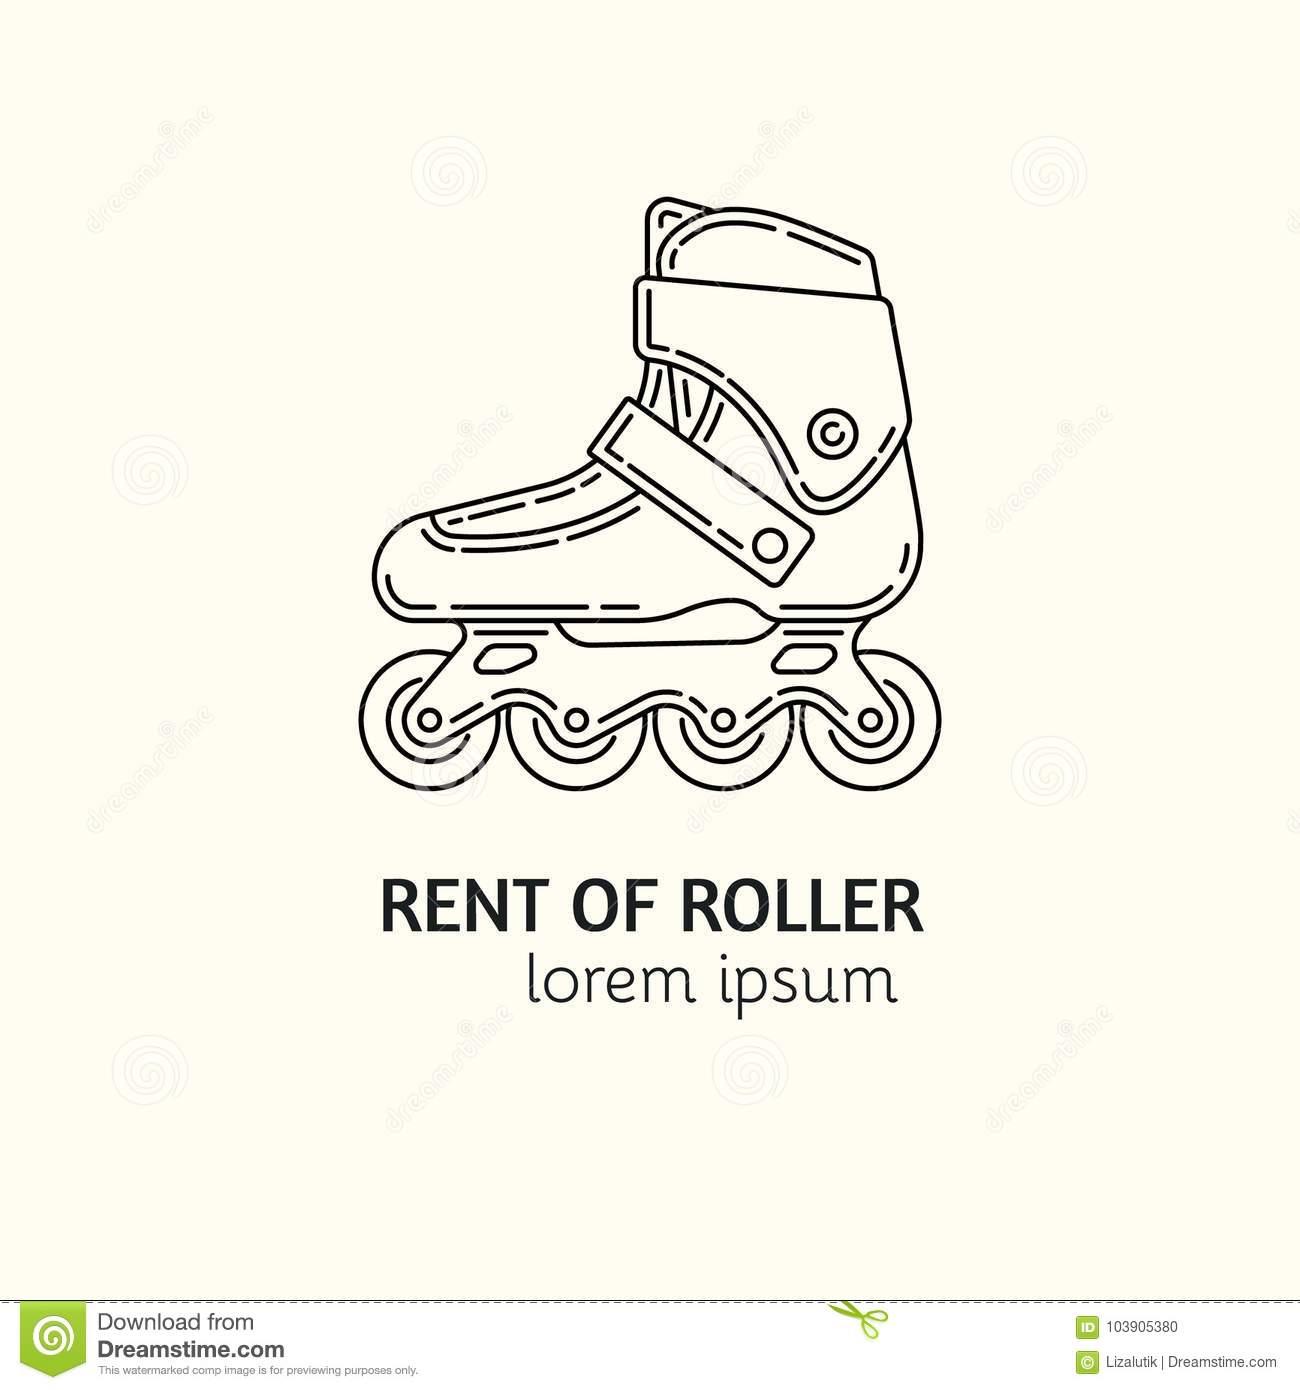 Modern Linear Style Rental Of Roller Skates Logotype Template